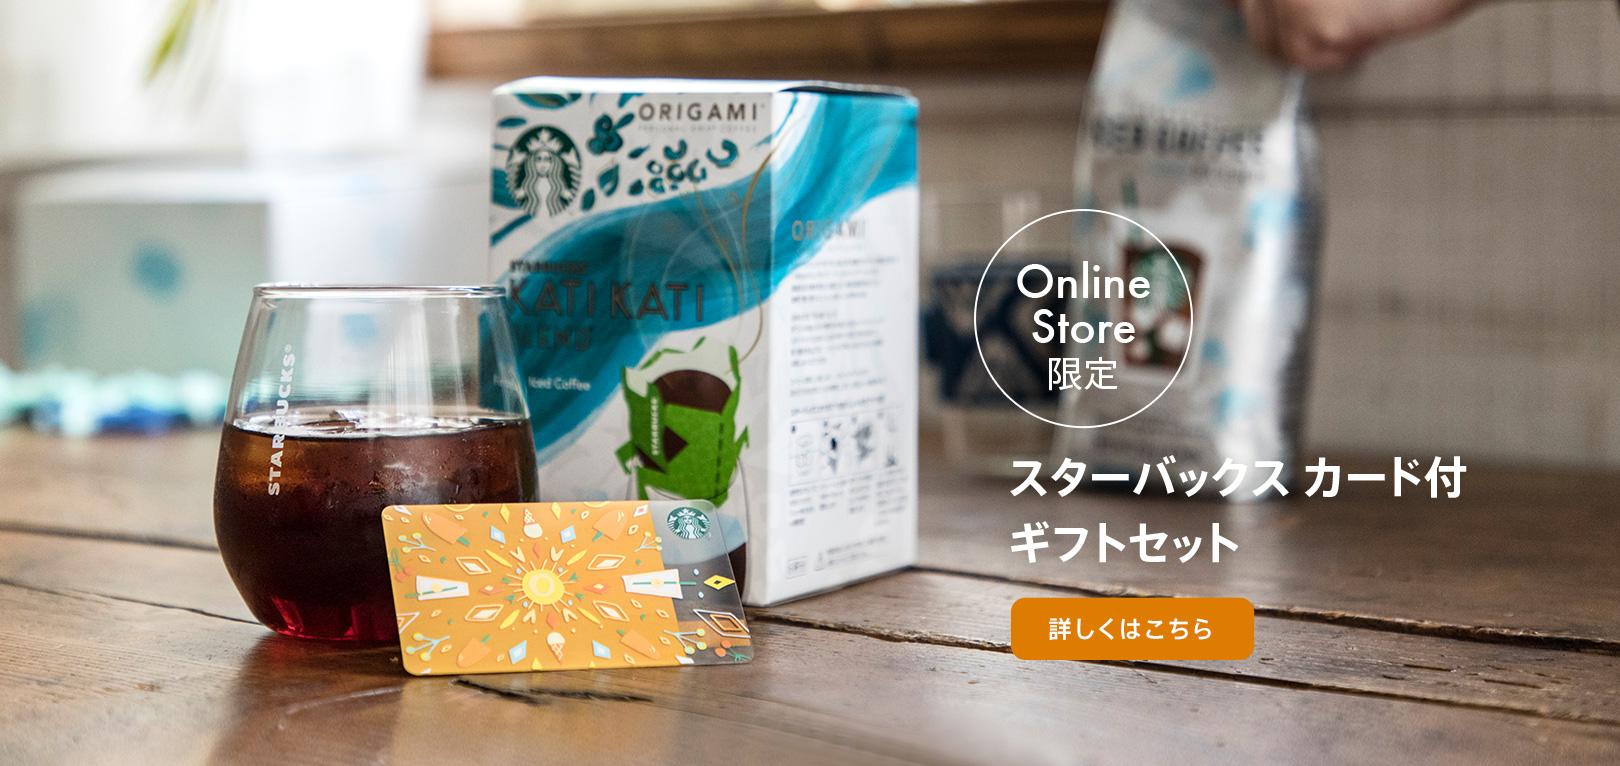 Starbucks online shop